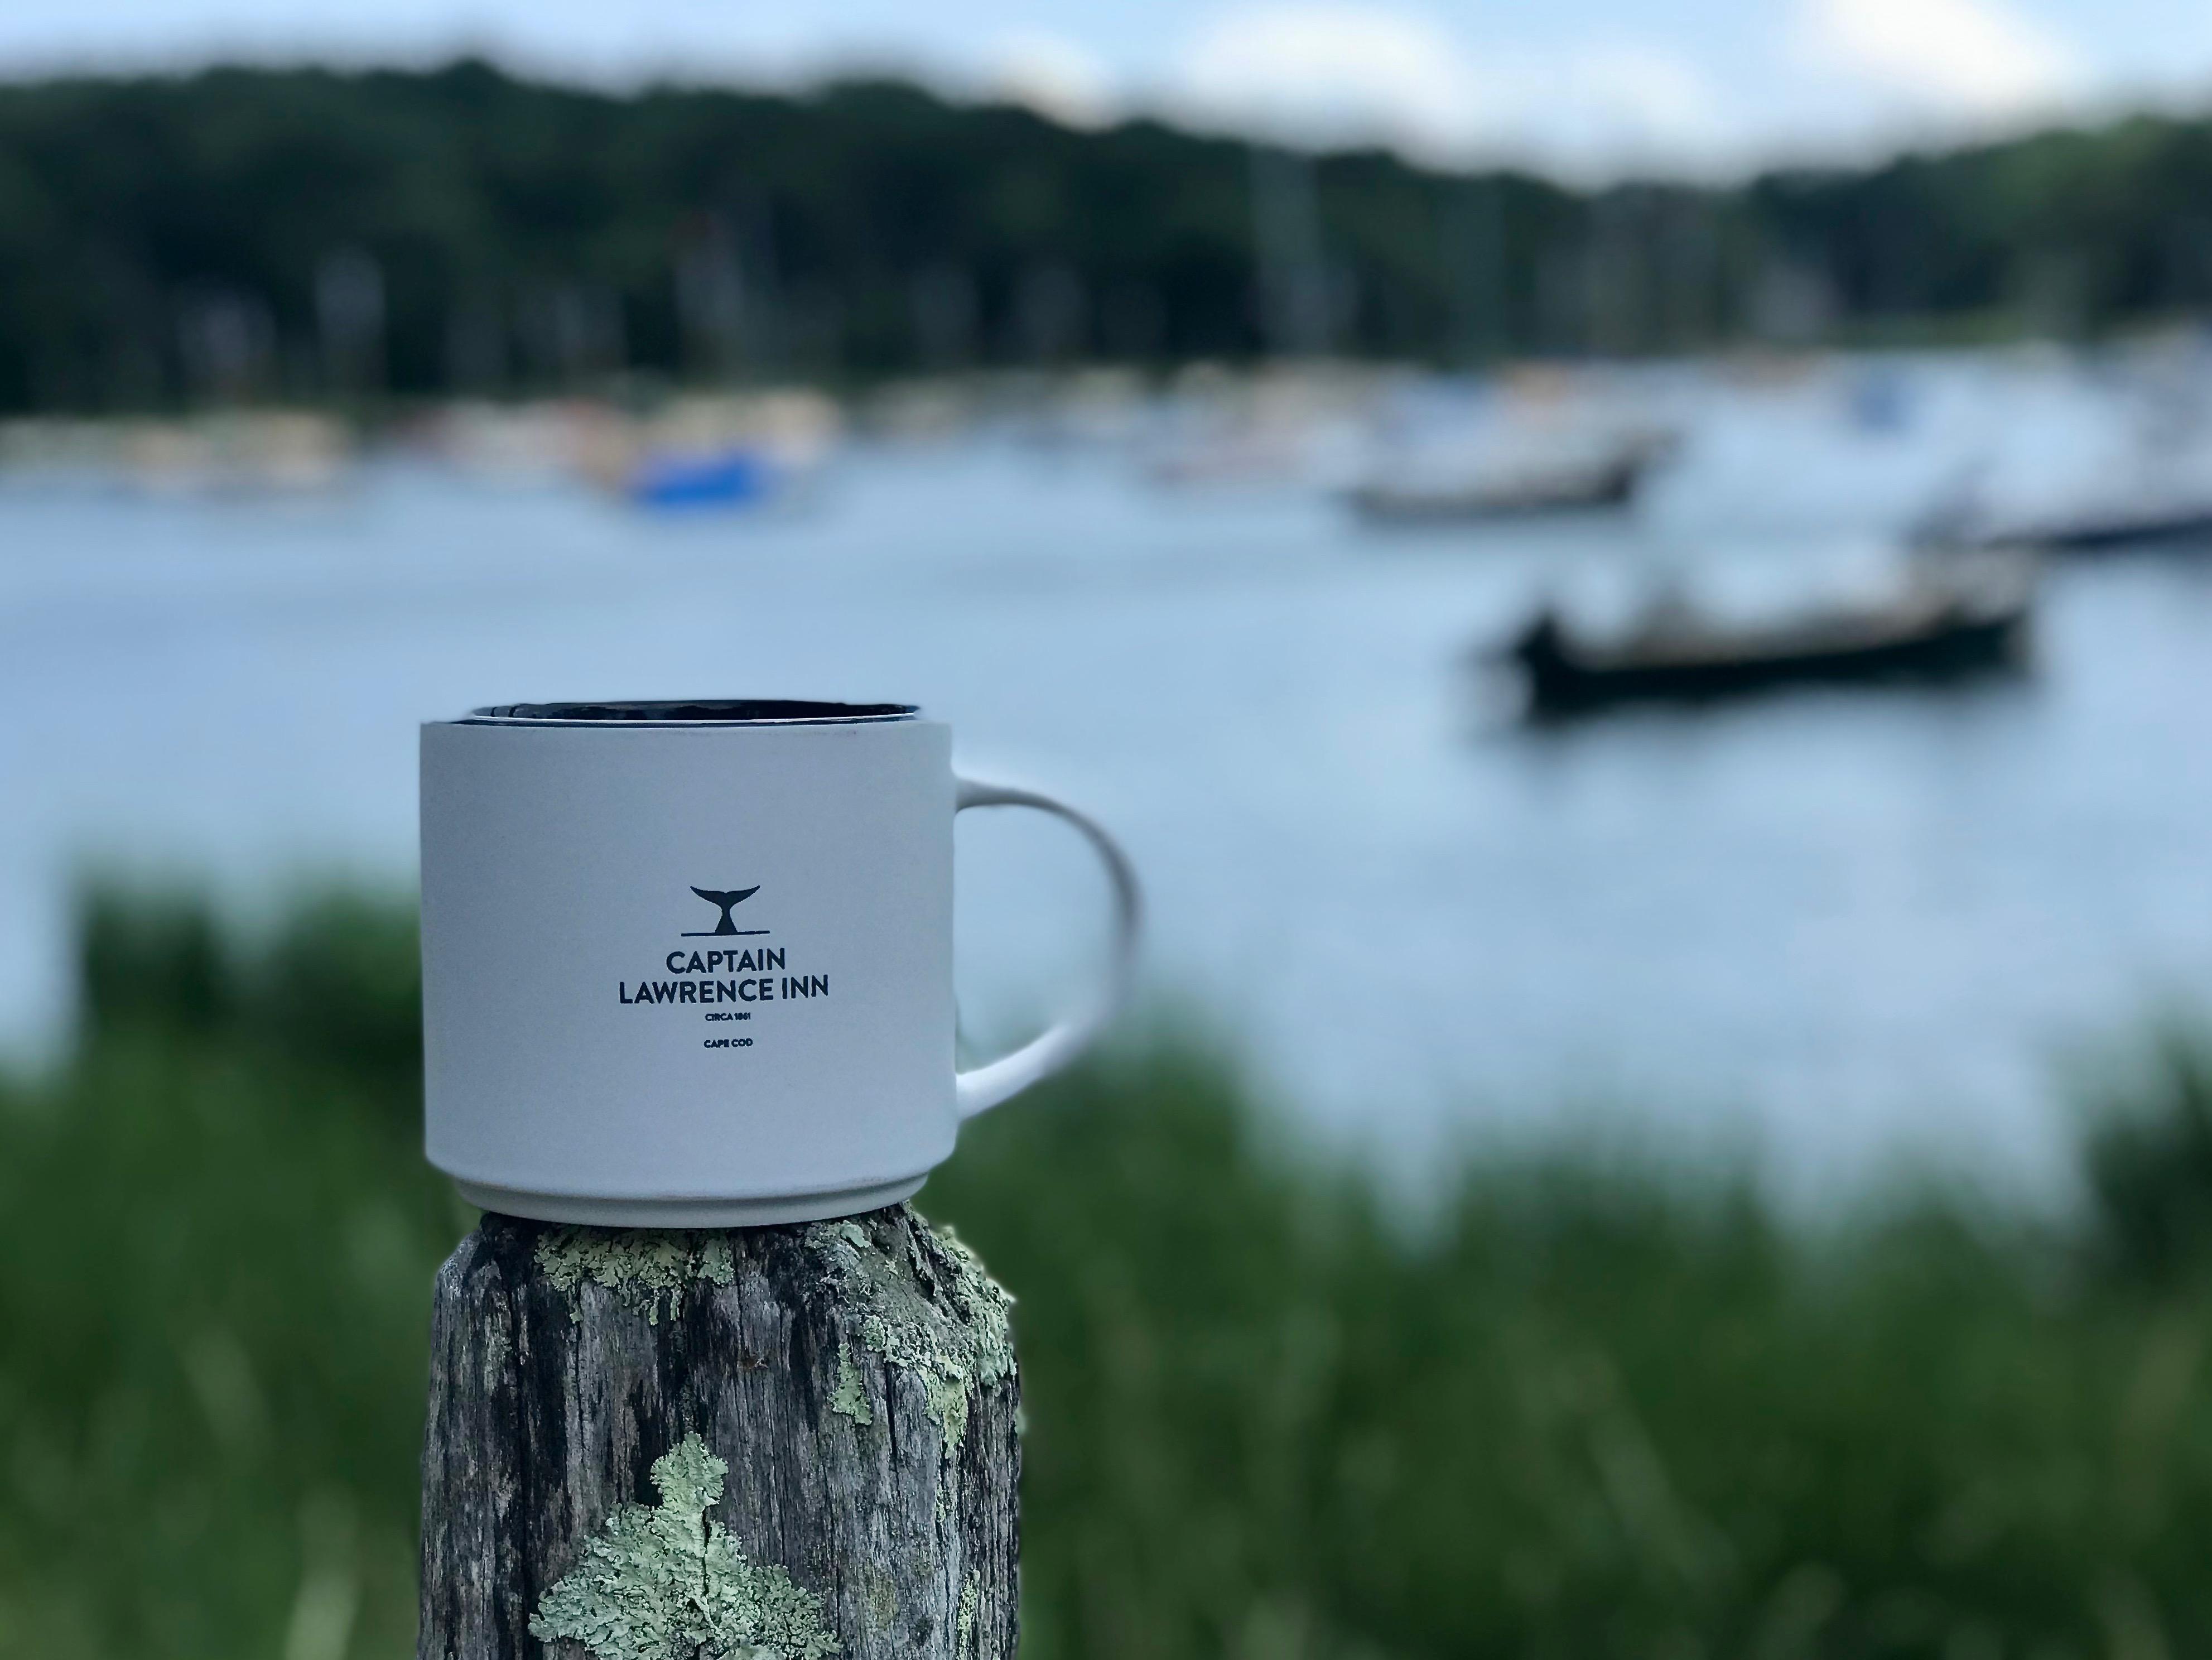 Captain Lawrence Inn coffee mug